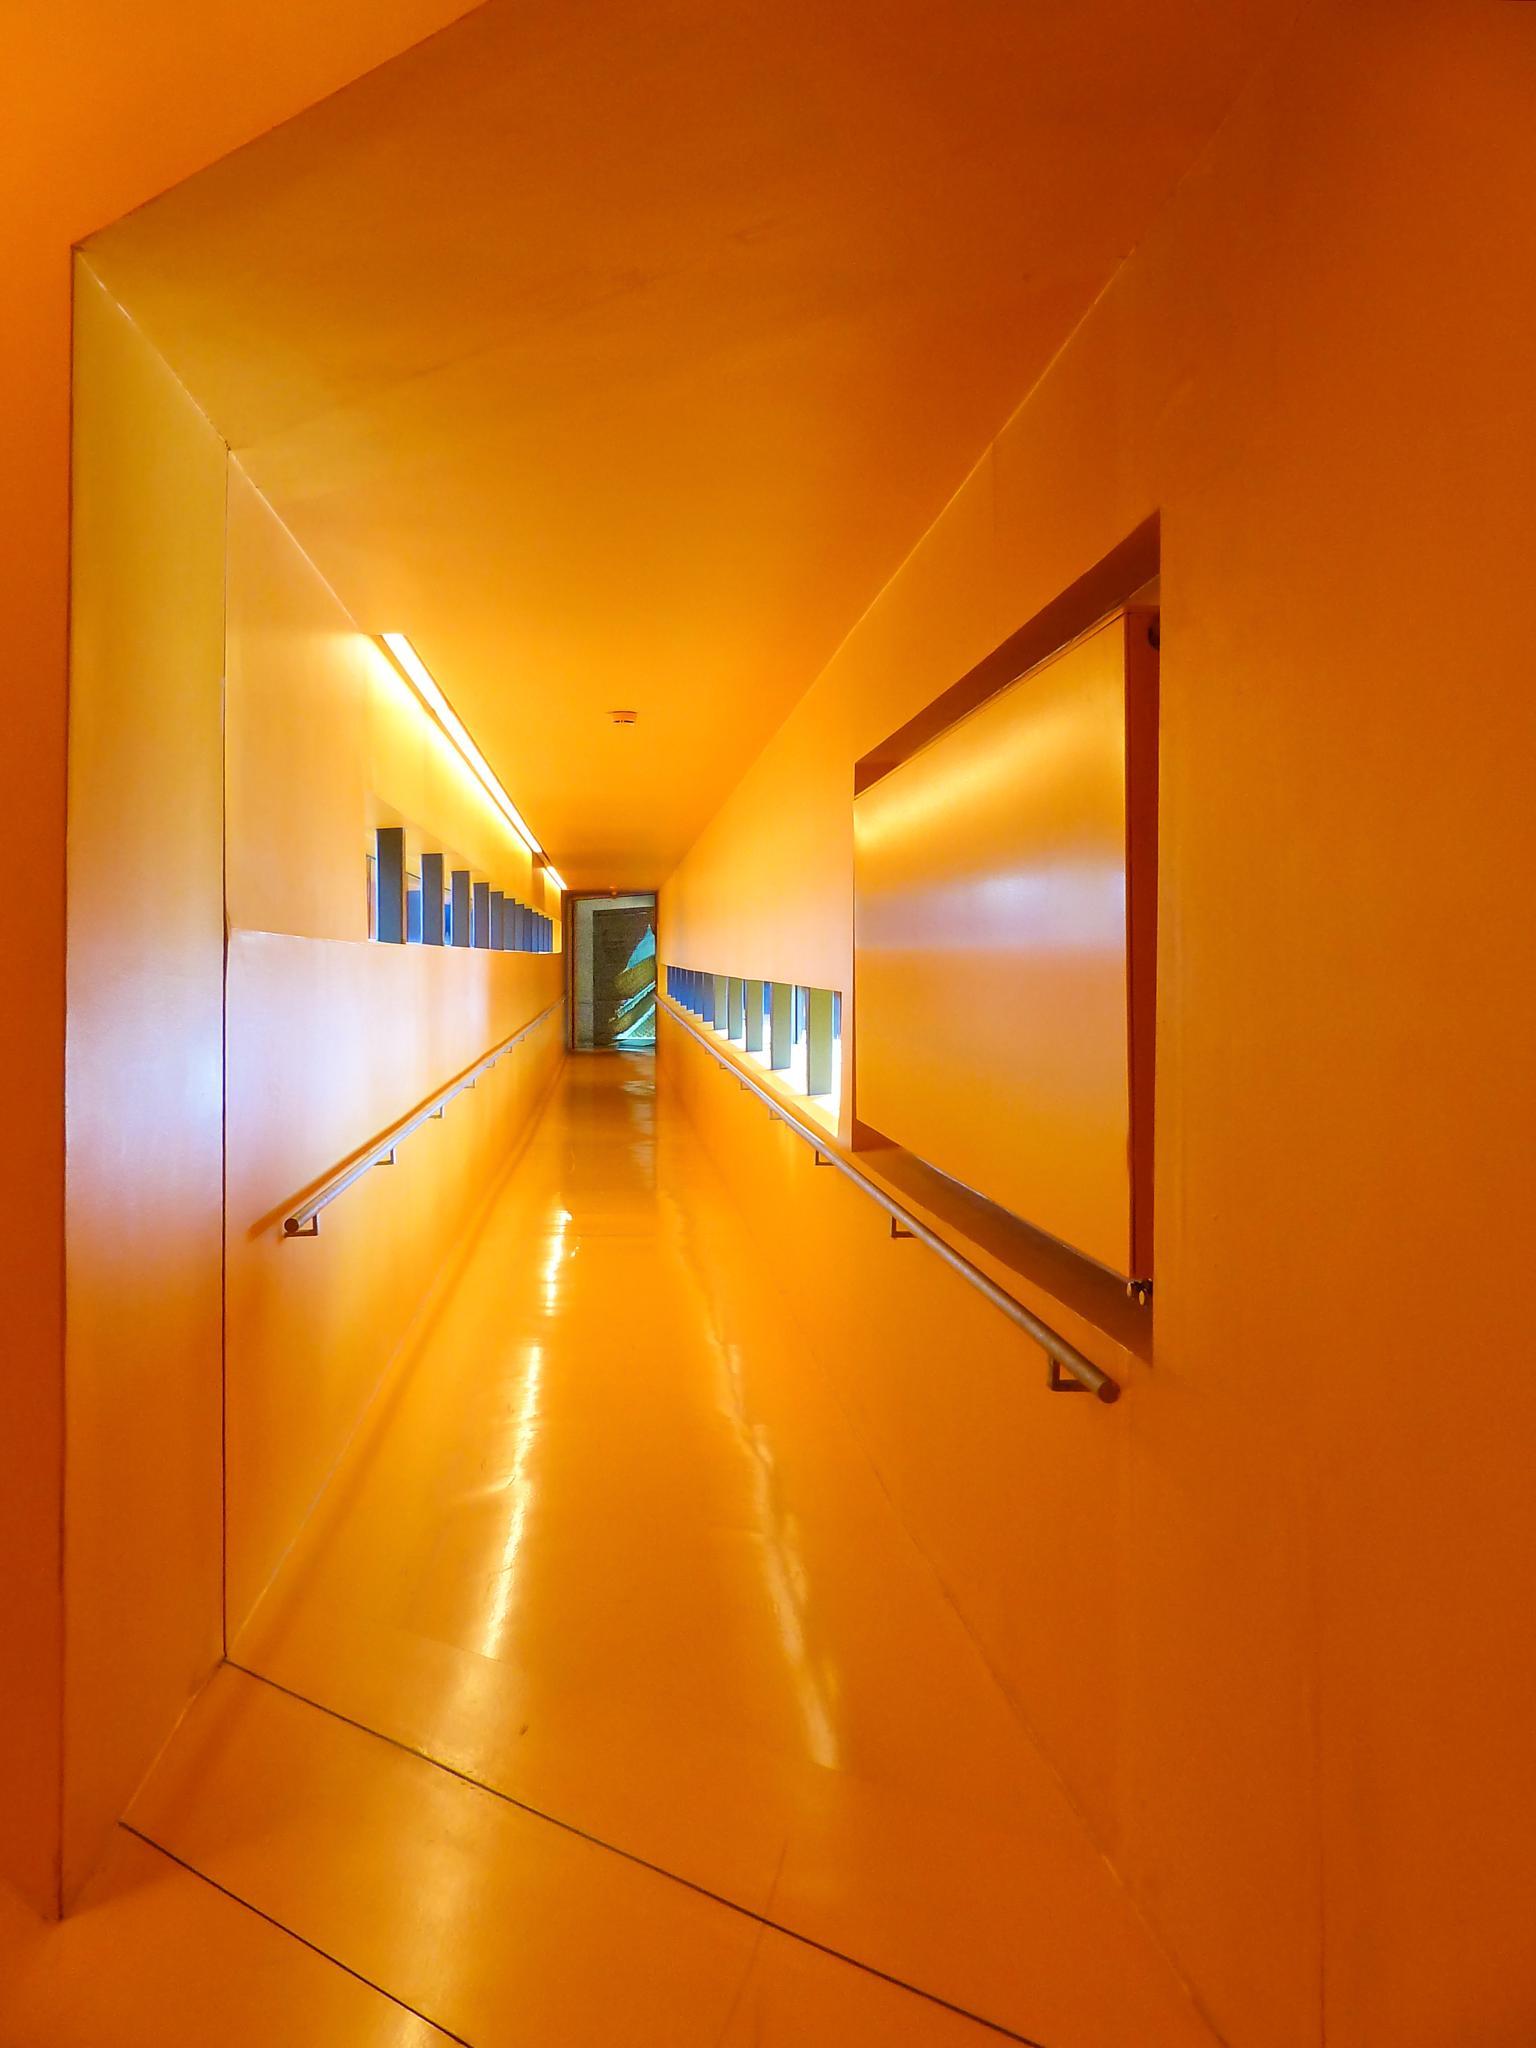 Orangene Stunde by Rolf Hilligloh